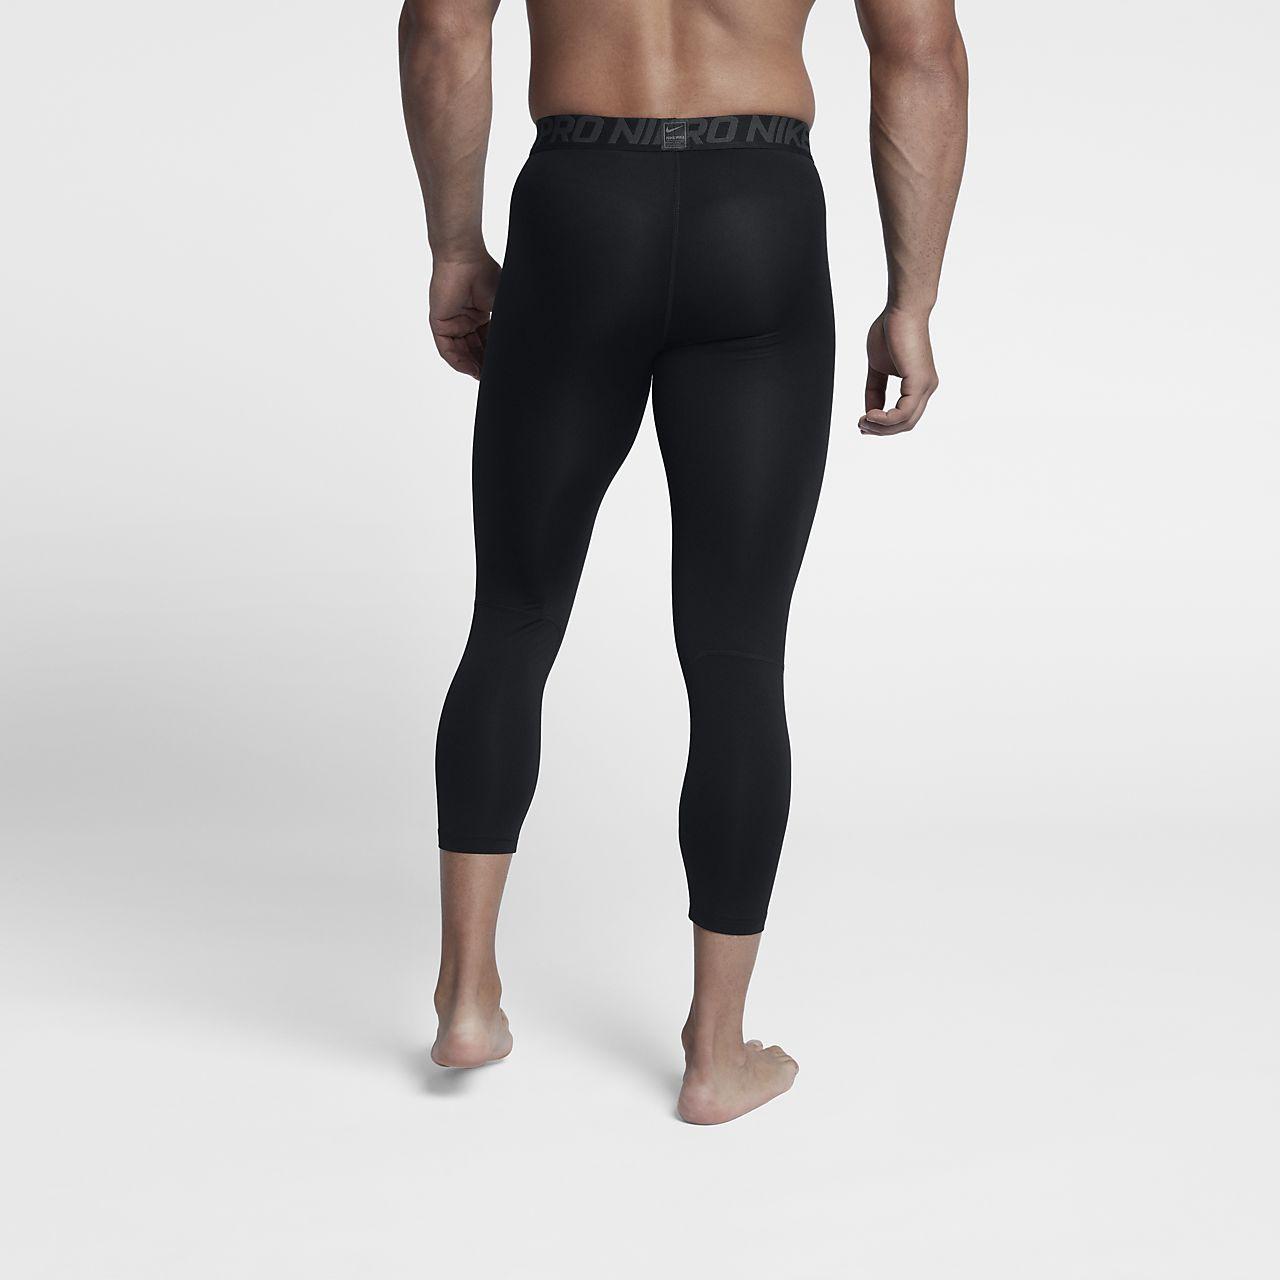 02f3c3a4a9c97 Nike Pro Men's 3/4 Training Tights. Nike.com NO